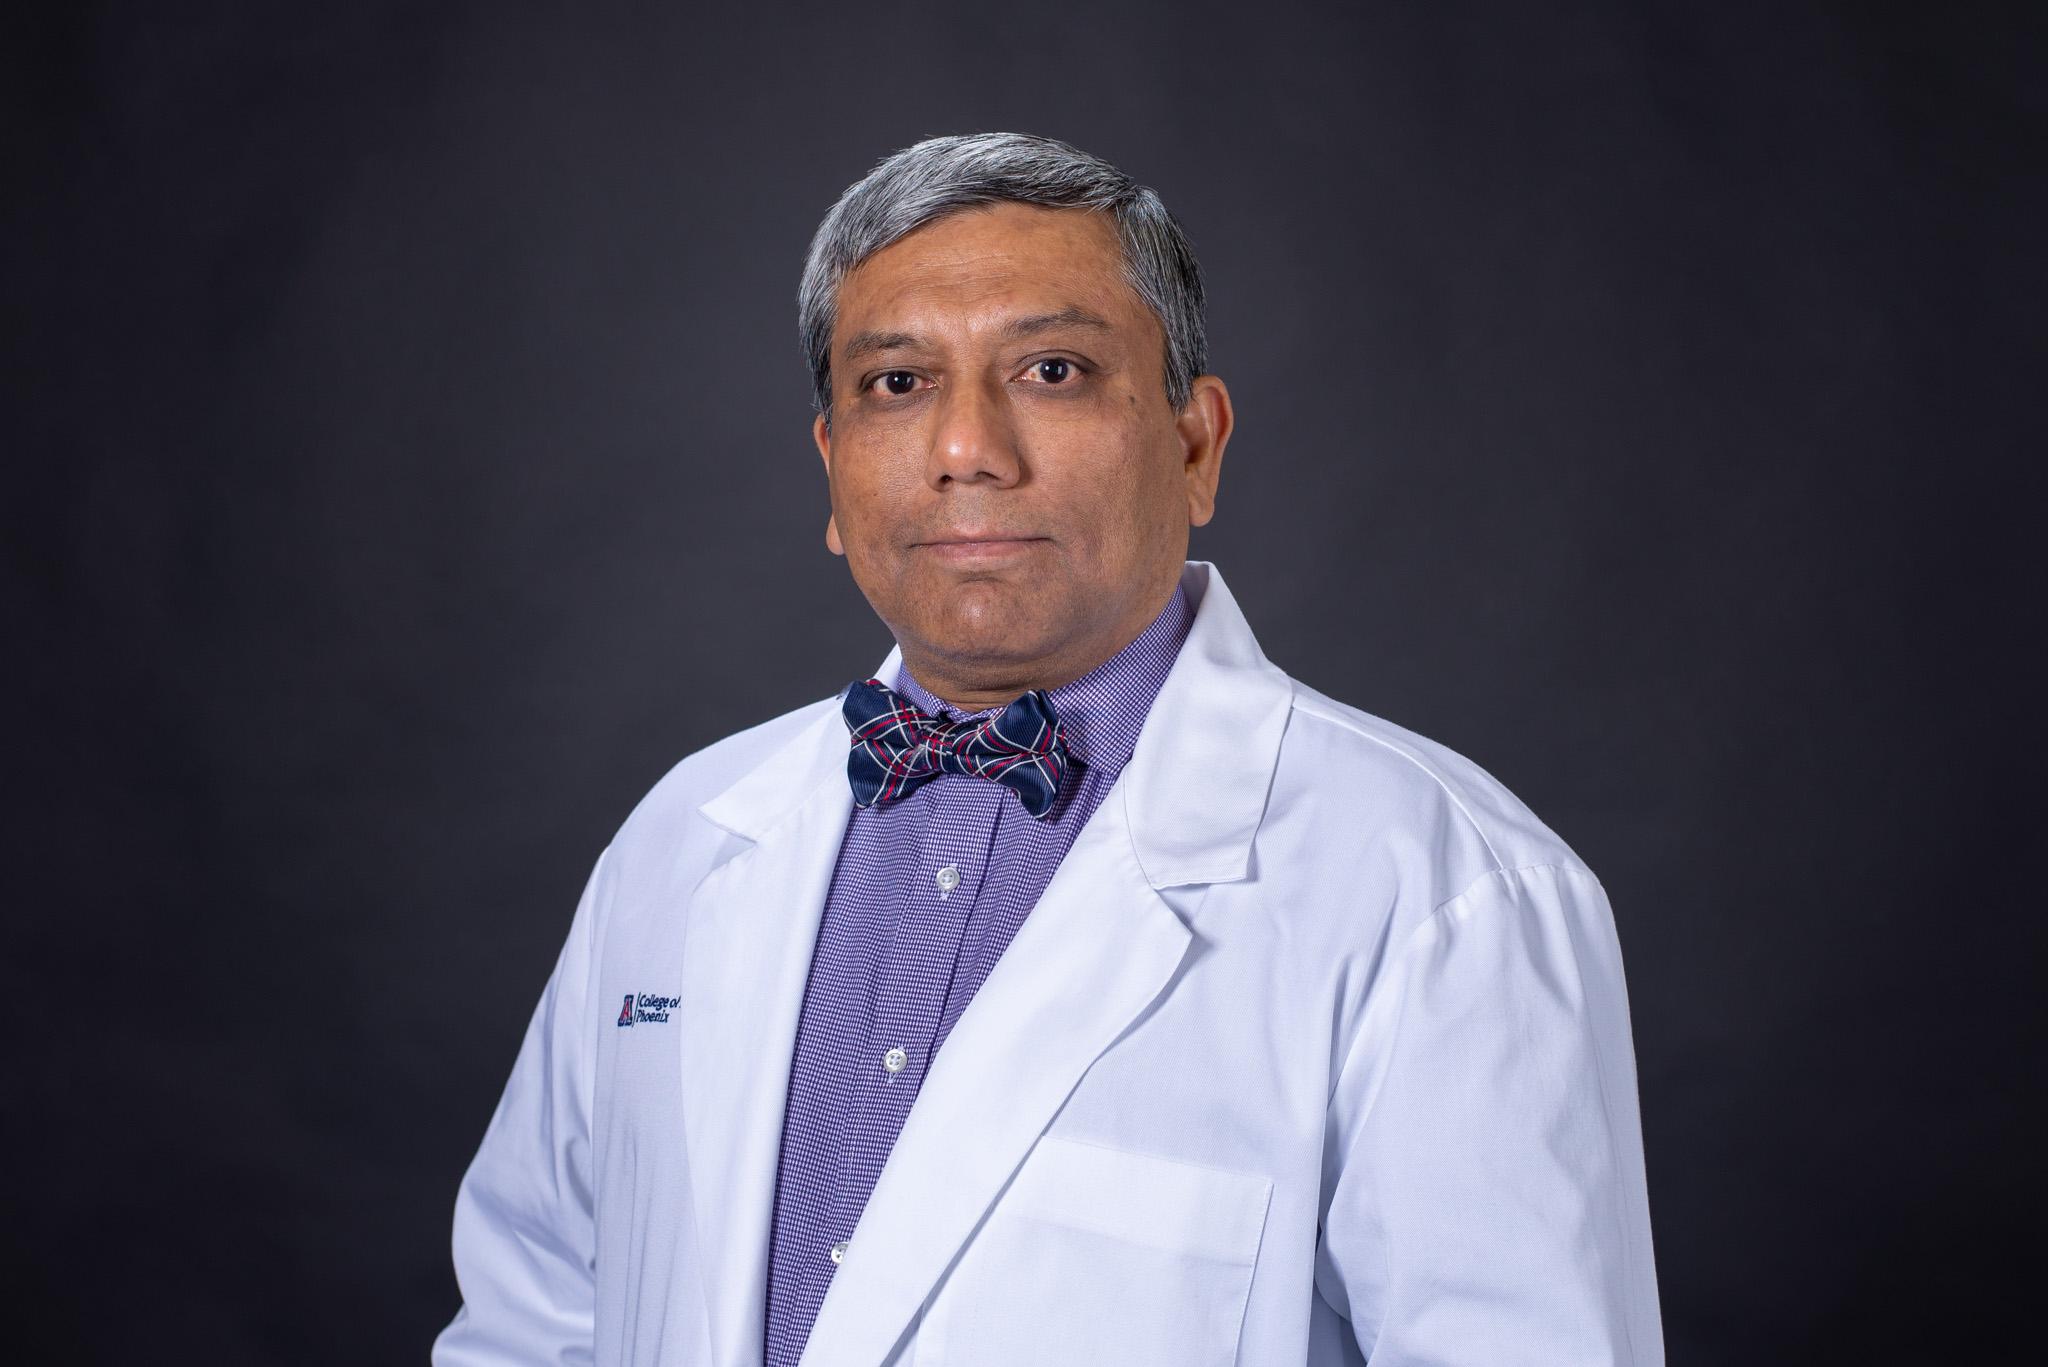 head shot photo of Sushovan Guha, M.D., Ph.D.